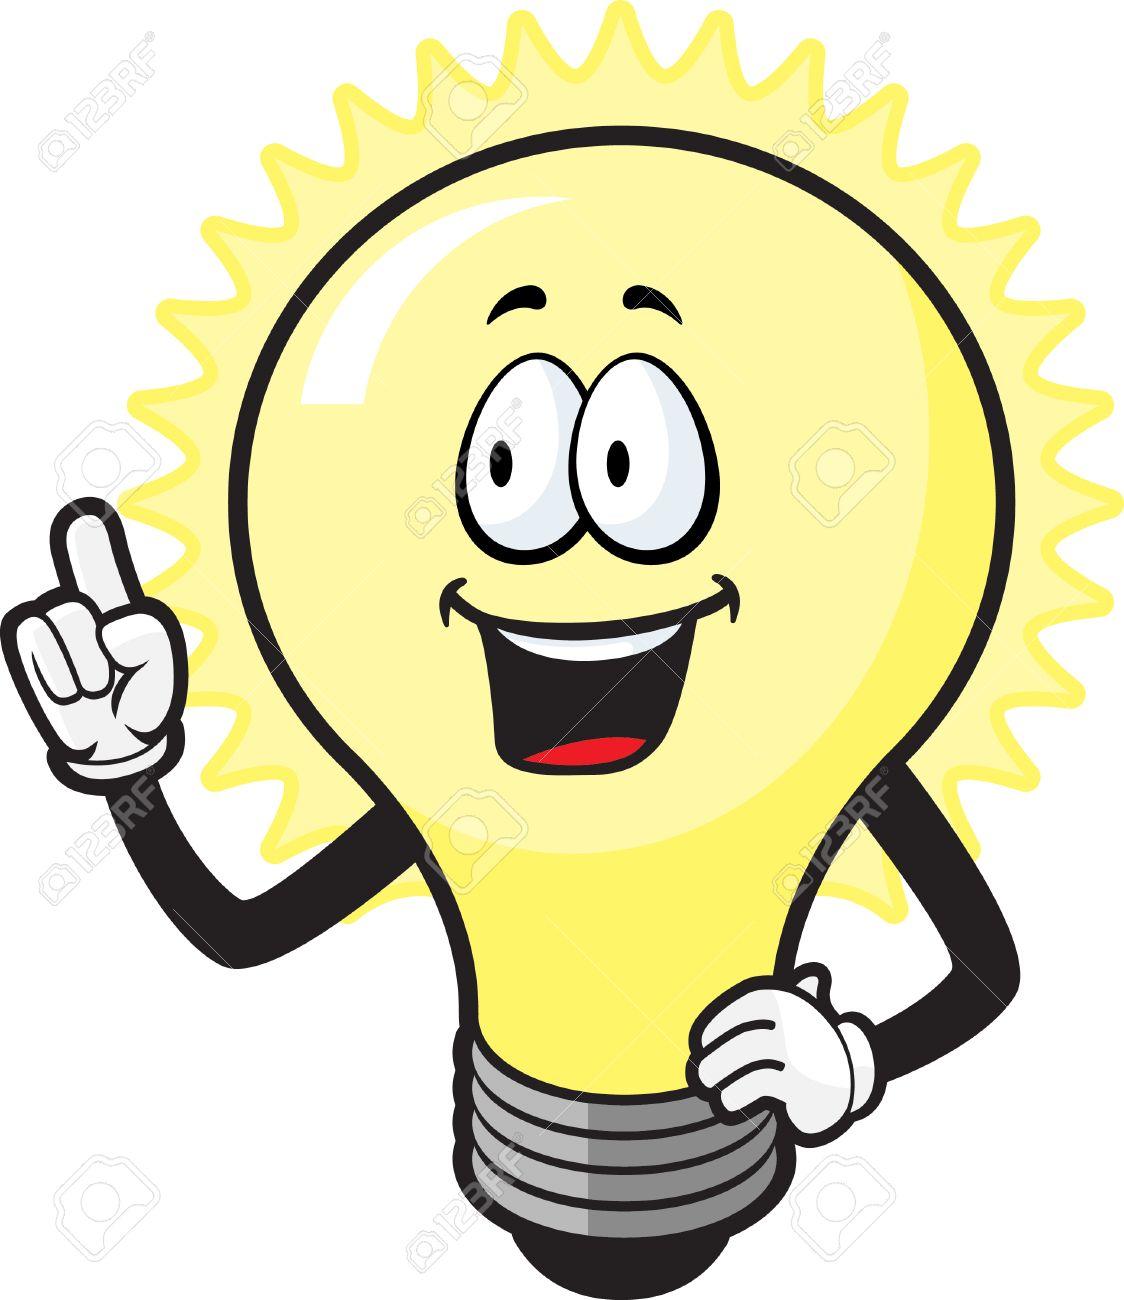 1124x1300 A Happy Cartoon Light Bulb With An Idea. Royalty Free Cliparts